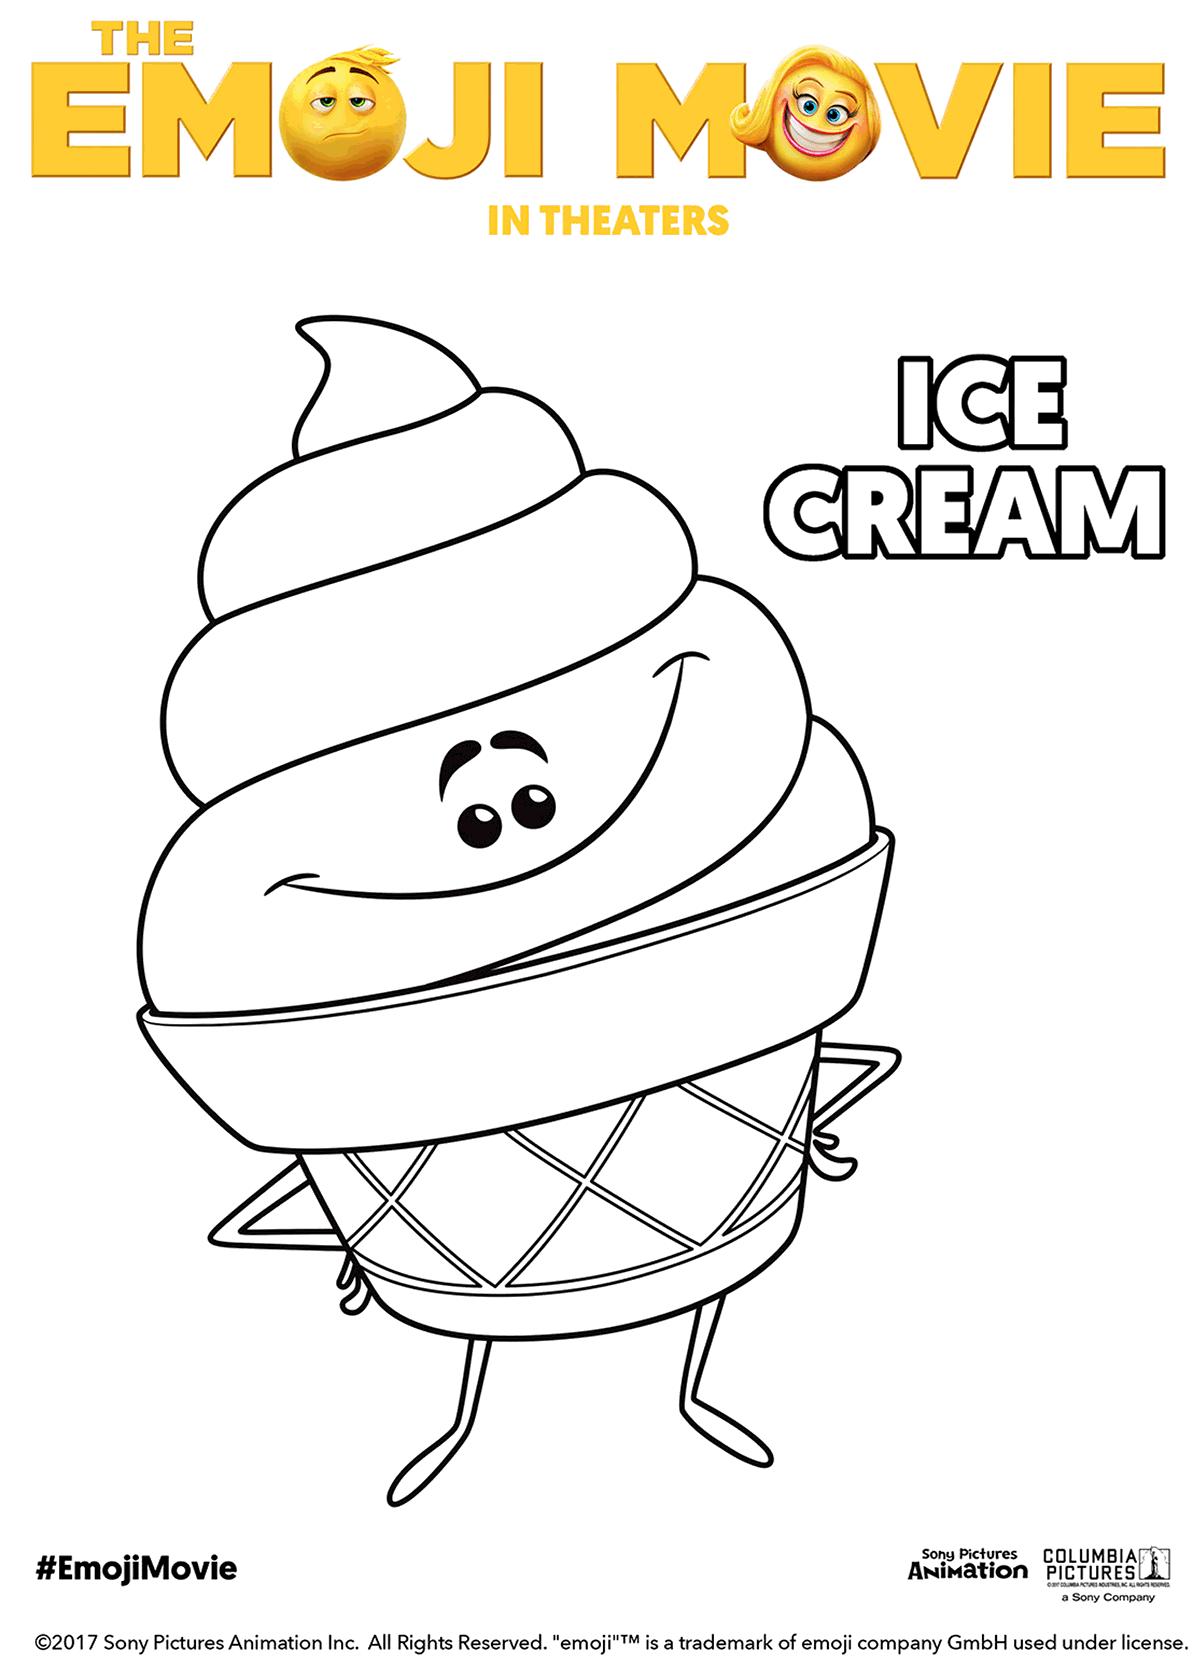 The Emoji Movie Ice Cream Coloring Page